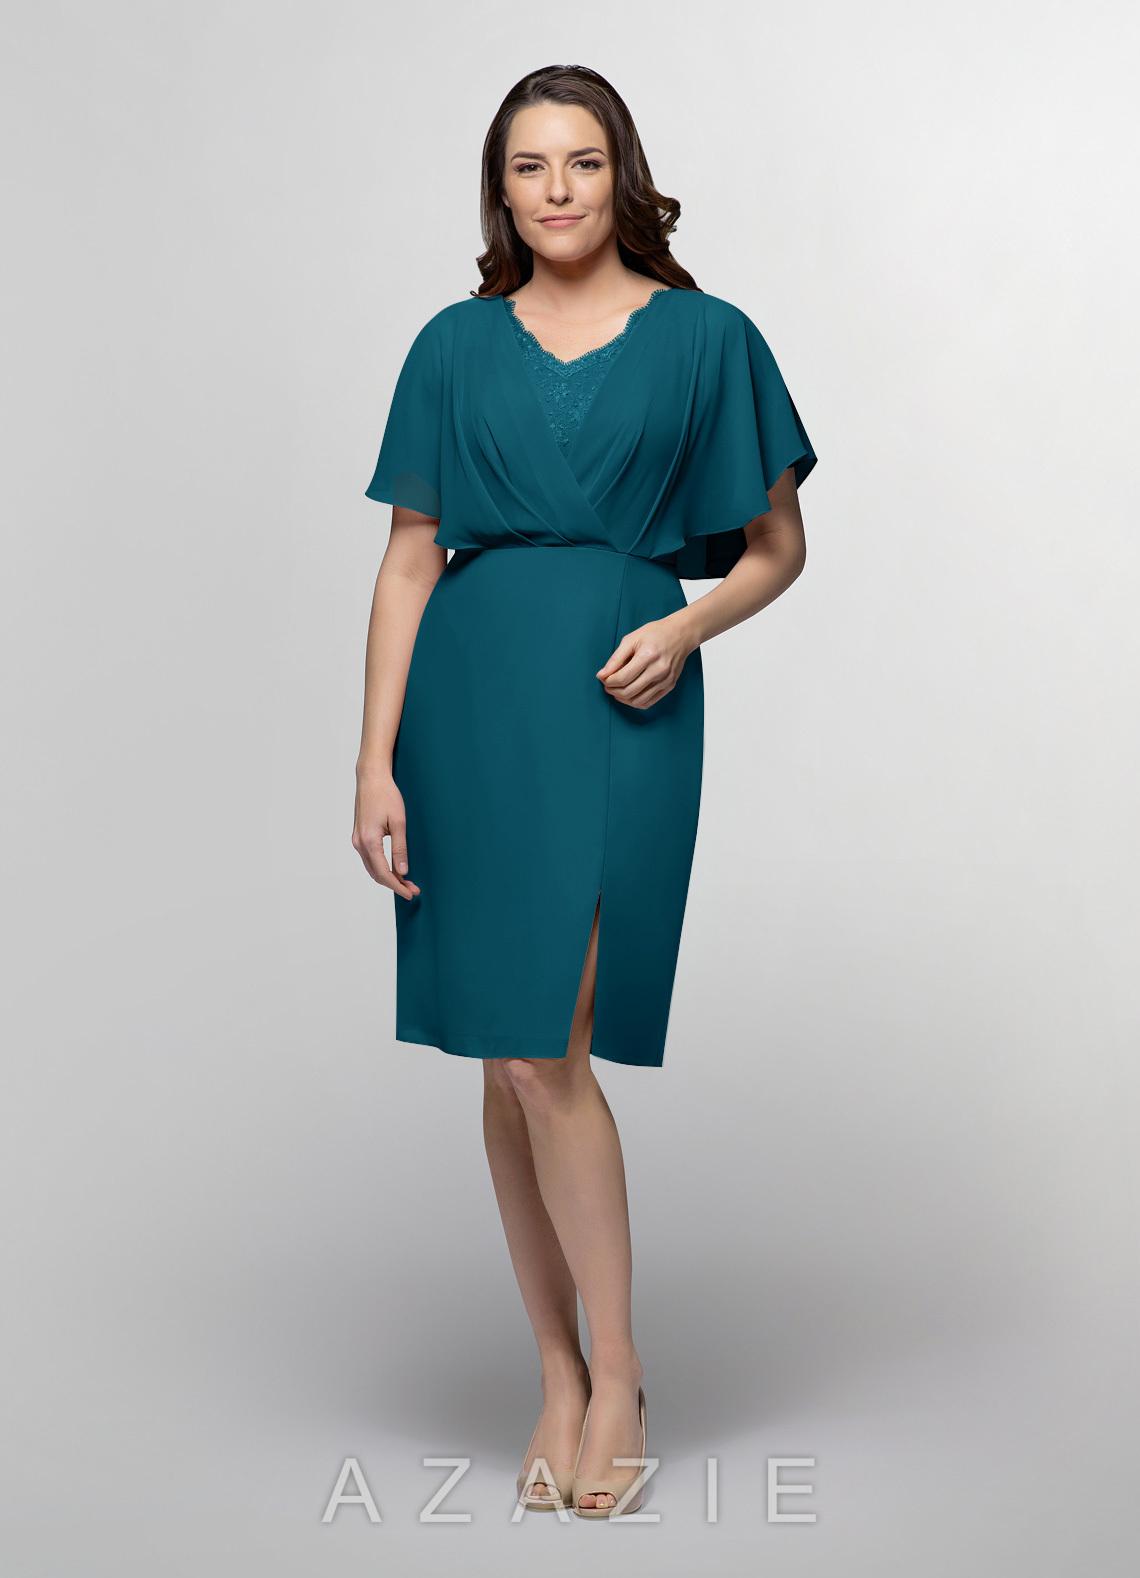 961e99e61d Azazie Aracely MBD Mother Of The Bride Dress - Ink Blue | Azazie